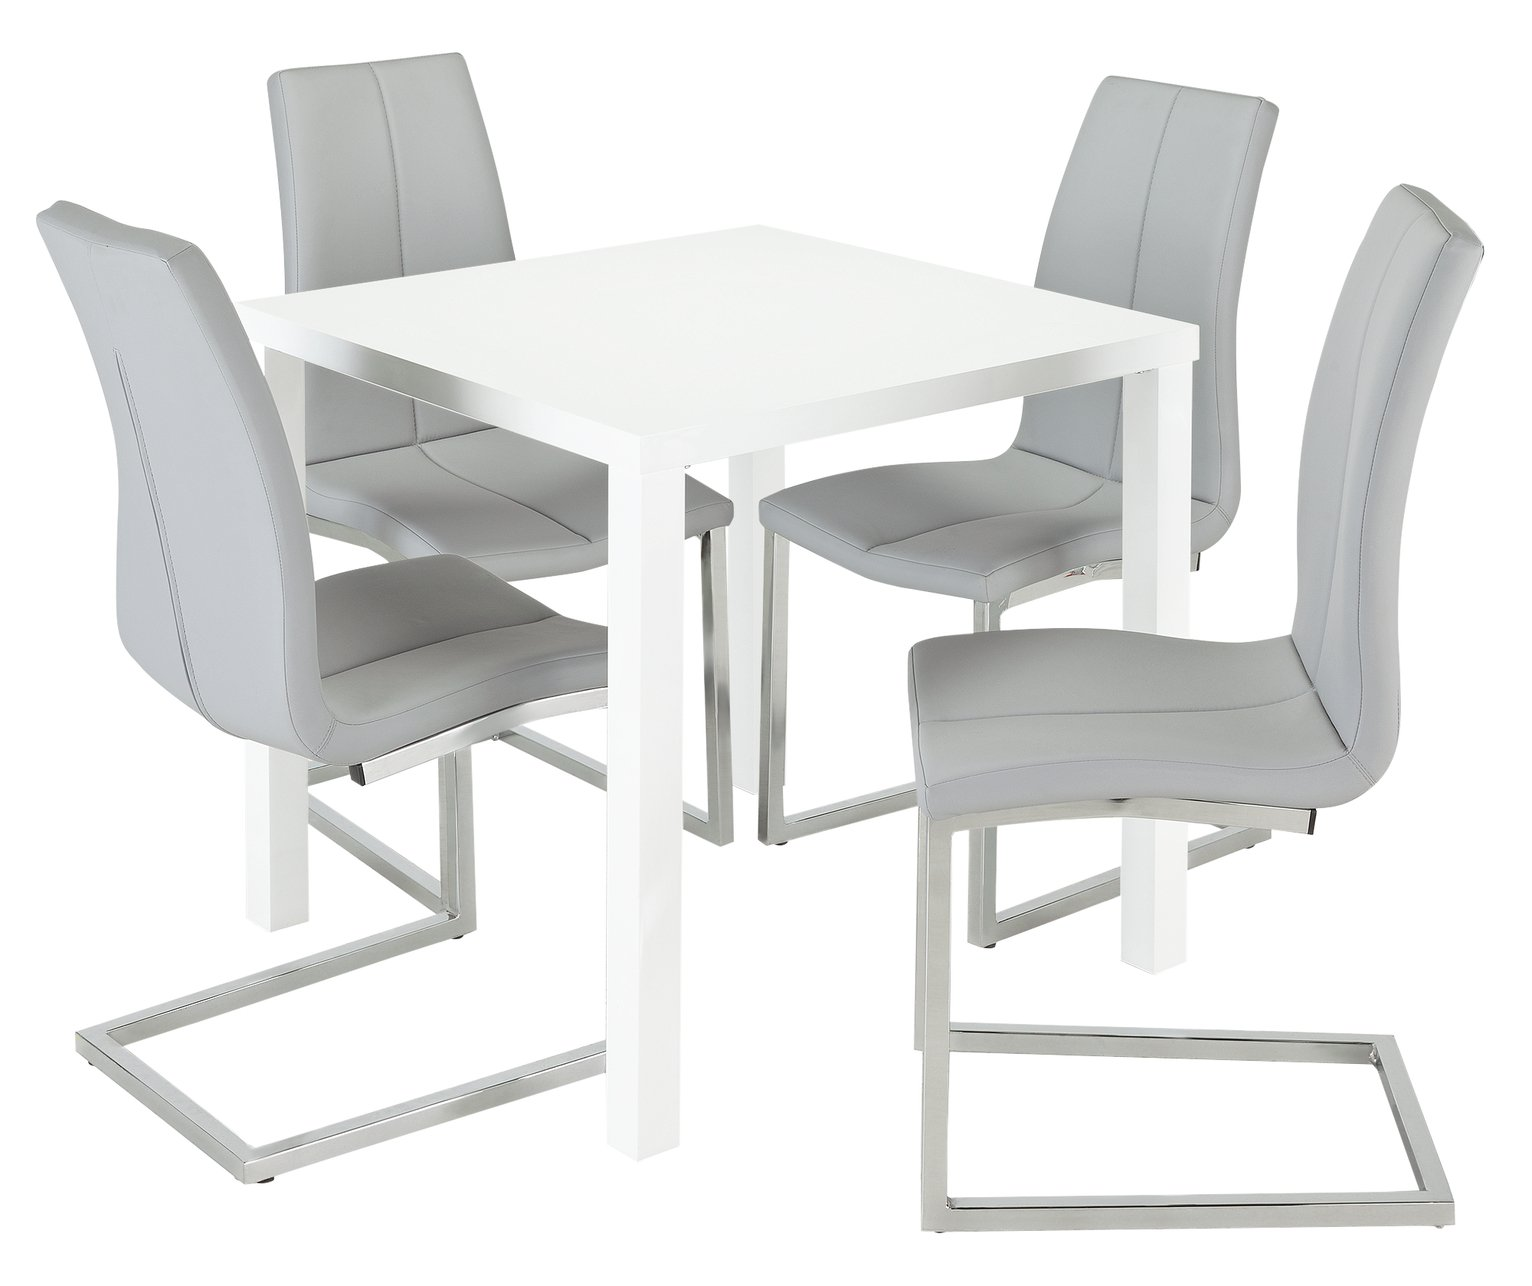 Argos Home Lyssa Gloss Dining Table & 4 Milo Chairs - Grey